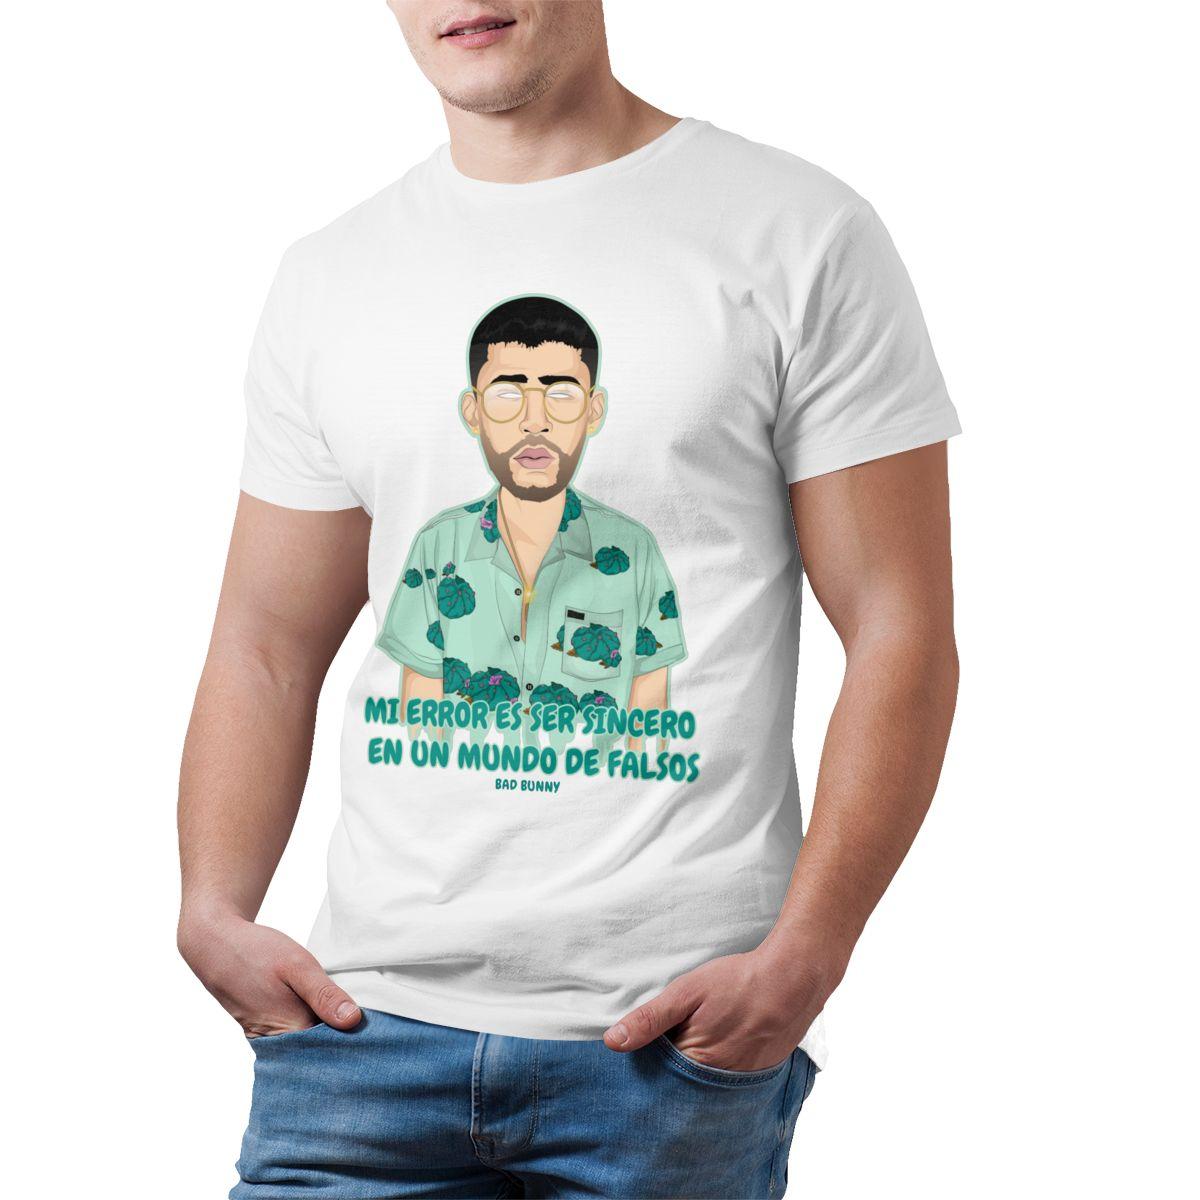 bad bunny short sleeve oversized t shirt bbm0108 2142 - Bad Bunny Store